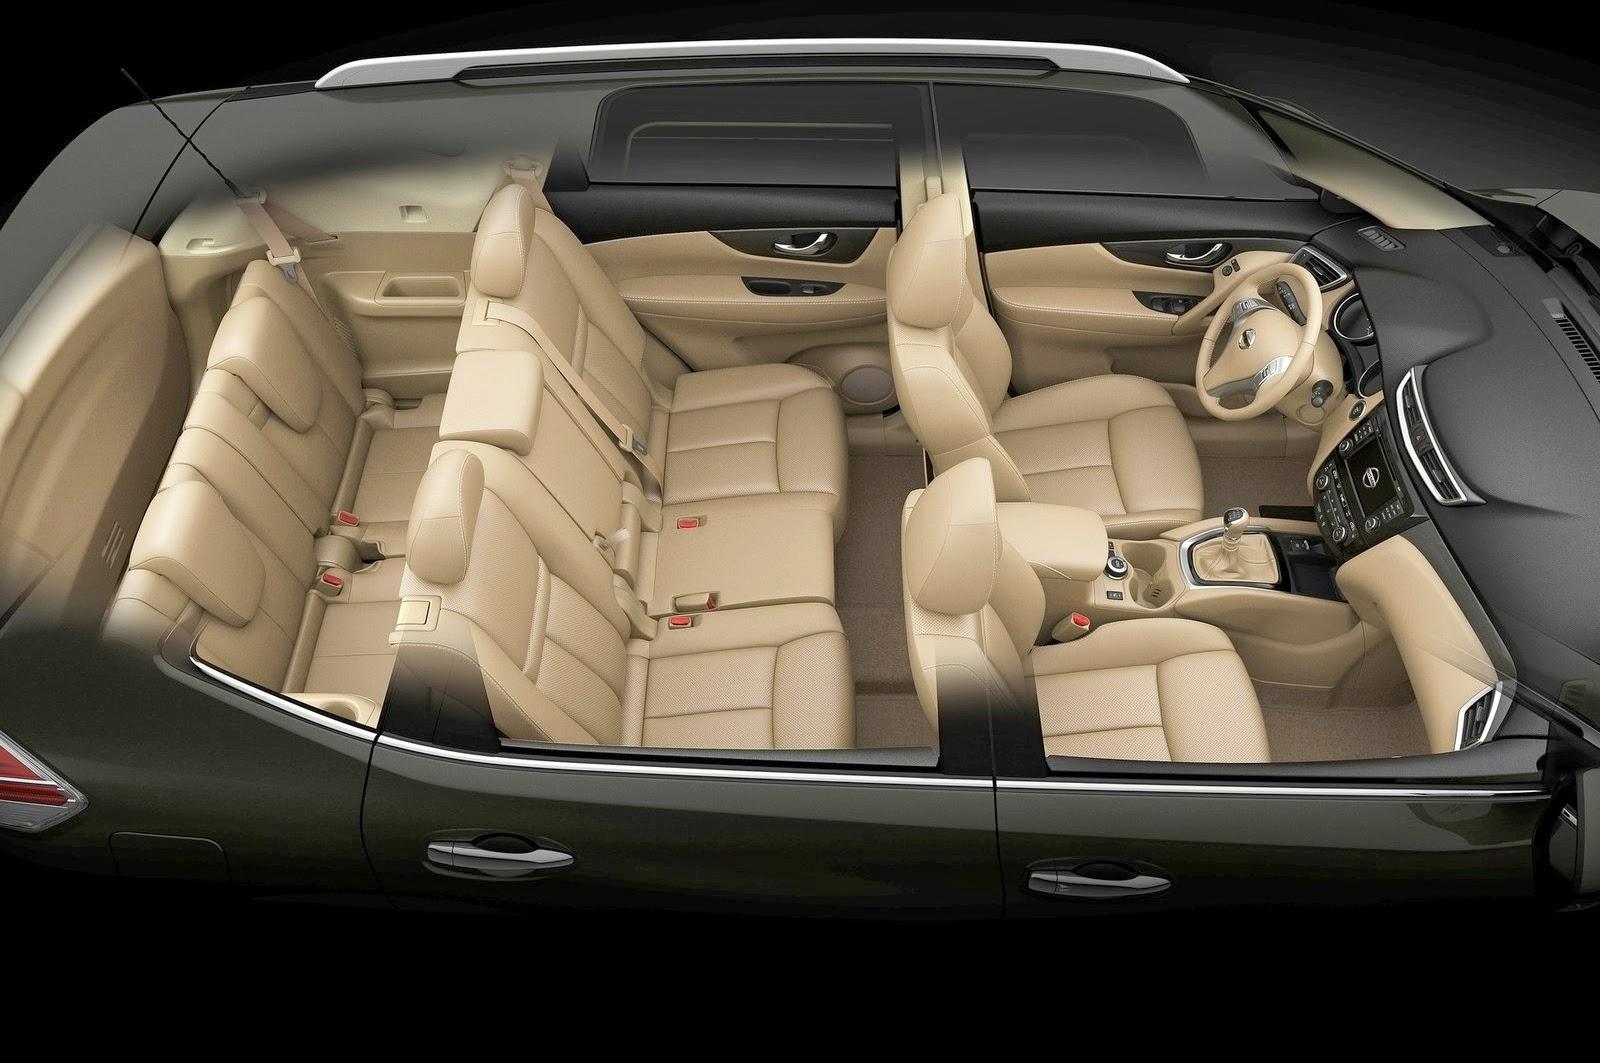 Nissan Rogue 3Rd Row >> Innovation Of The All New 2014 Nissan Rogue Marlboro Nissan